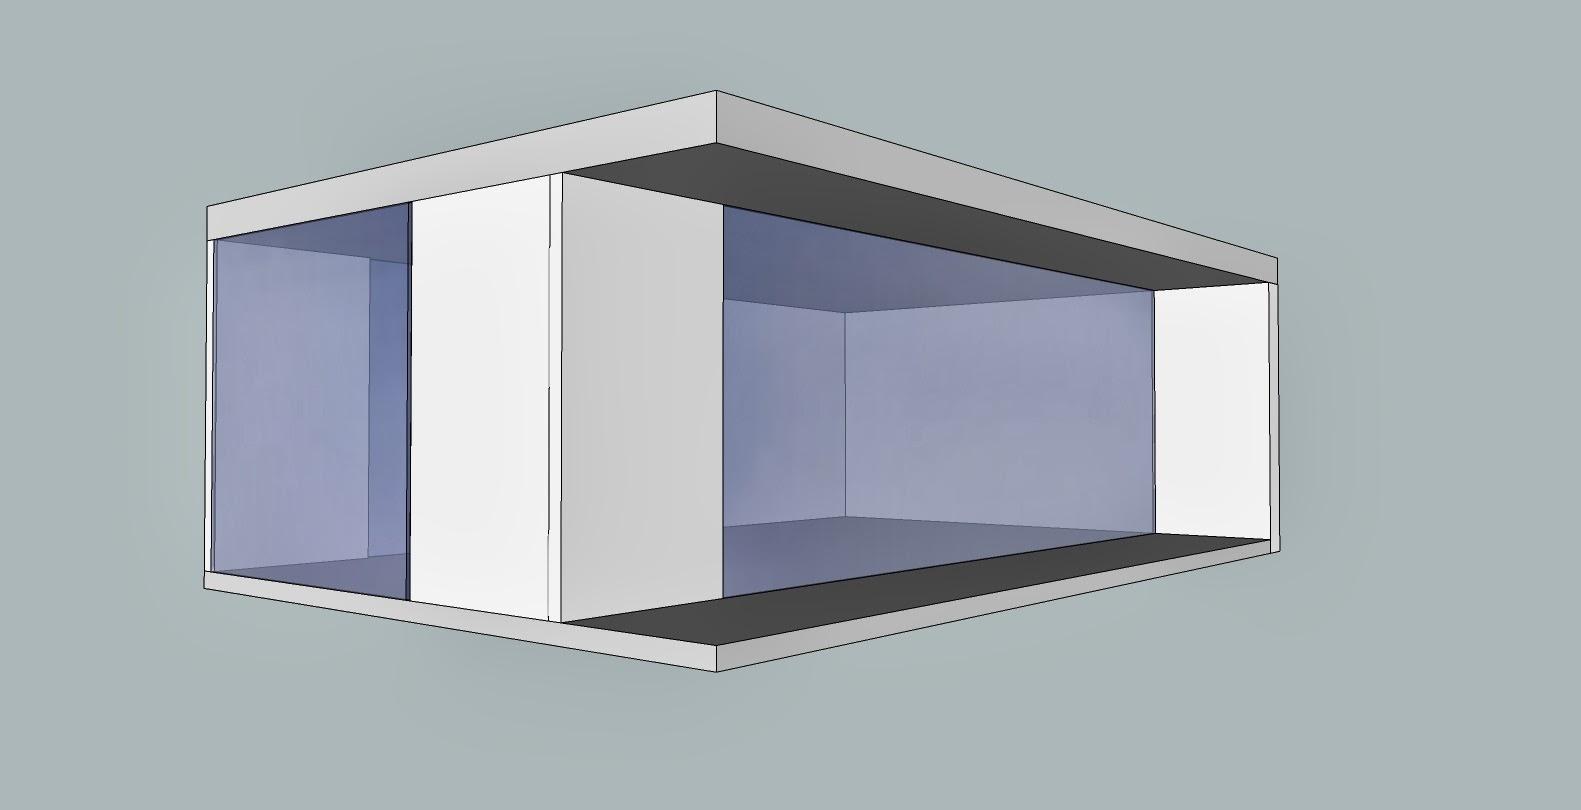 Prototipo de módulo para casa de muñecas moderna